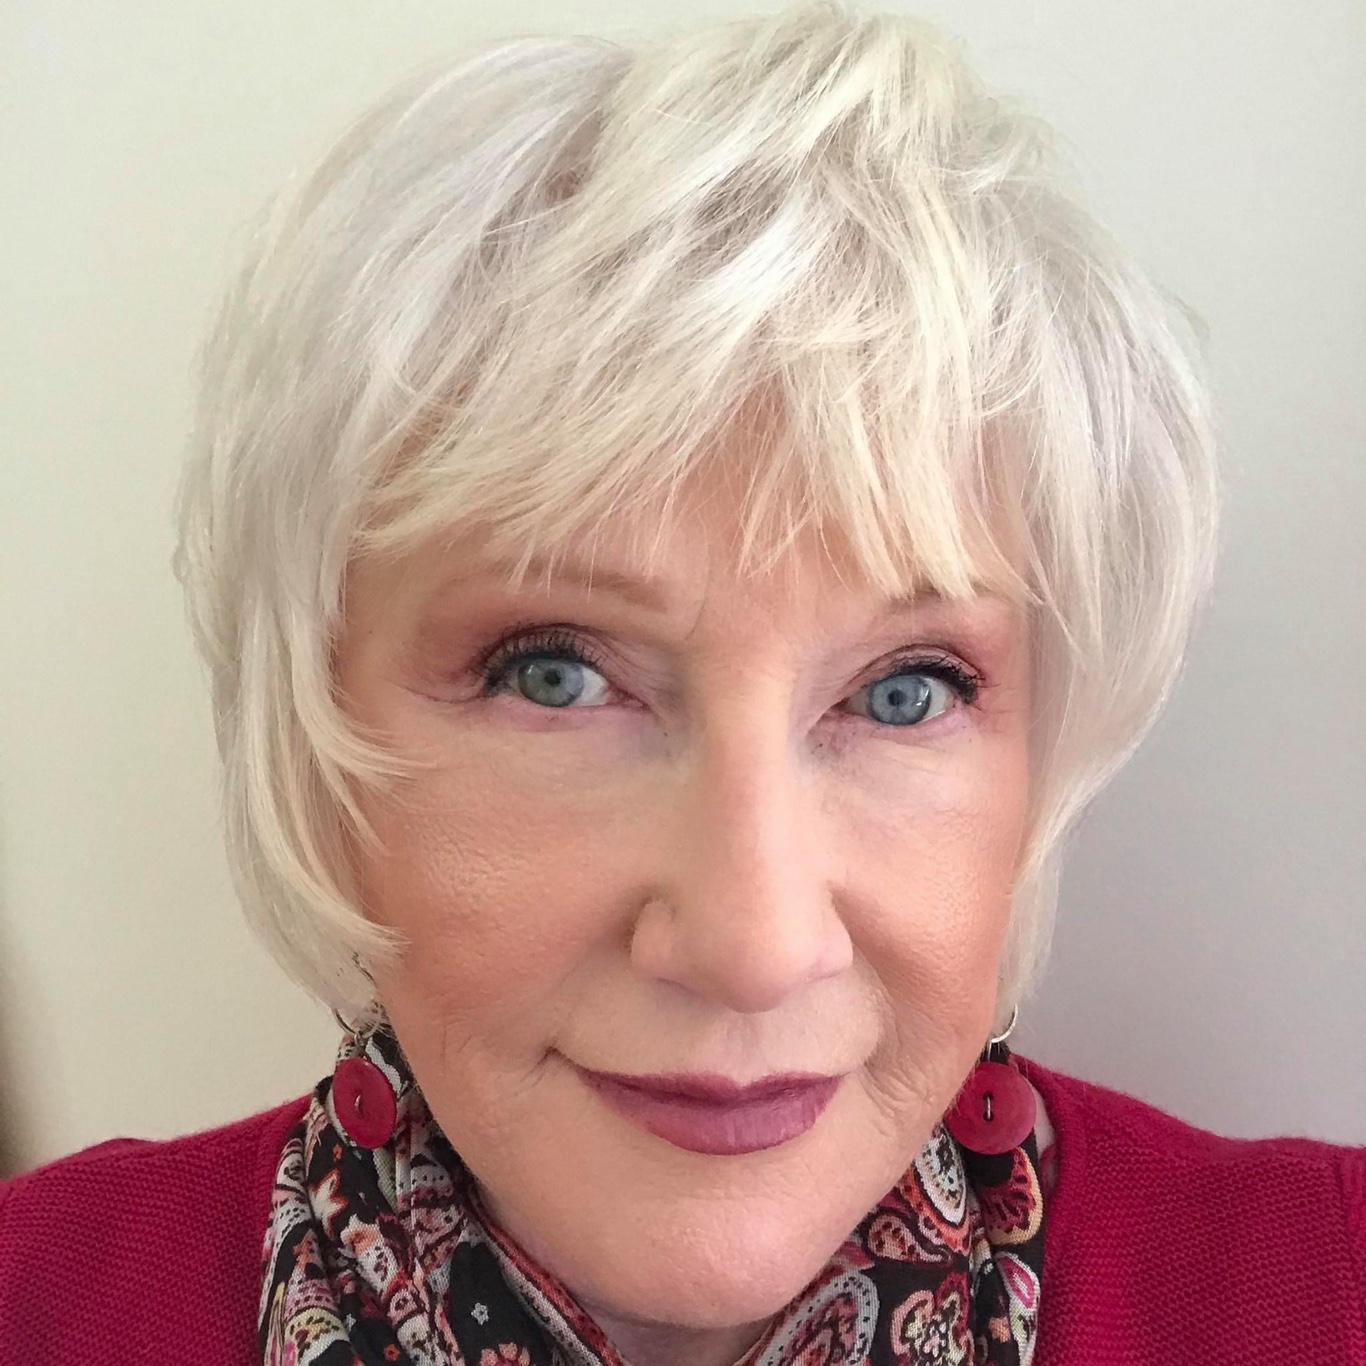 Season 3 Episode 35: Valerie Peachey on Beginnings, Adventures & Life Stories